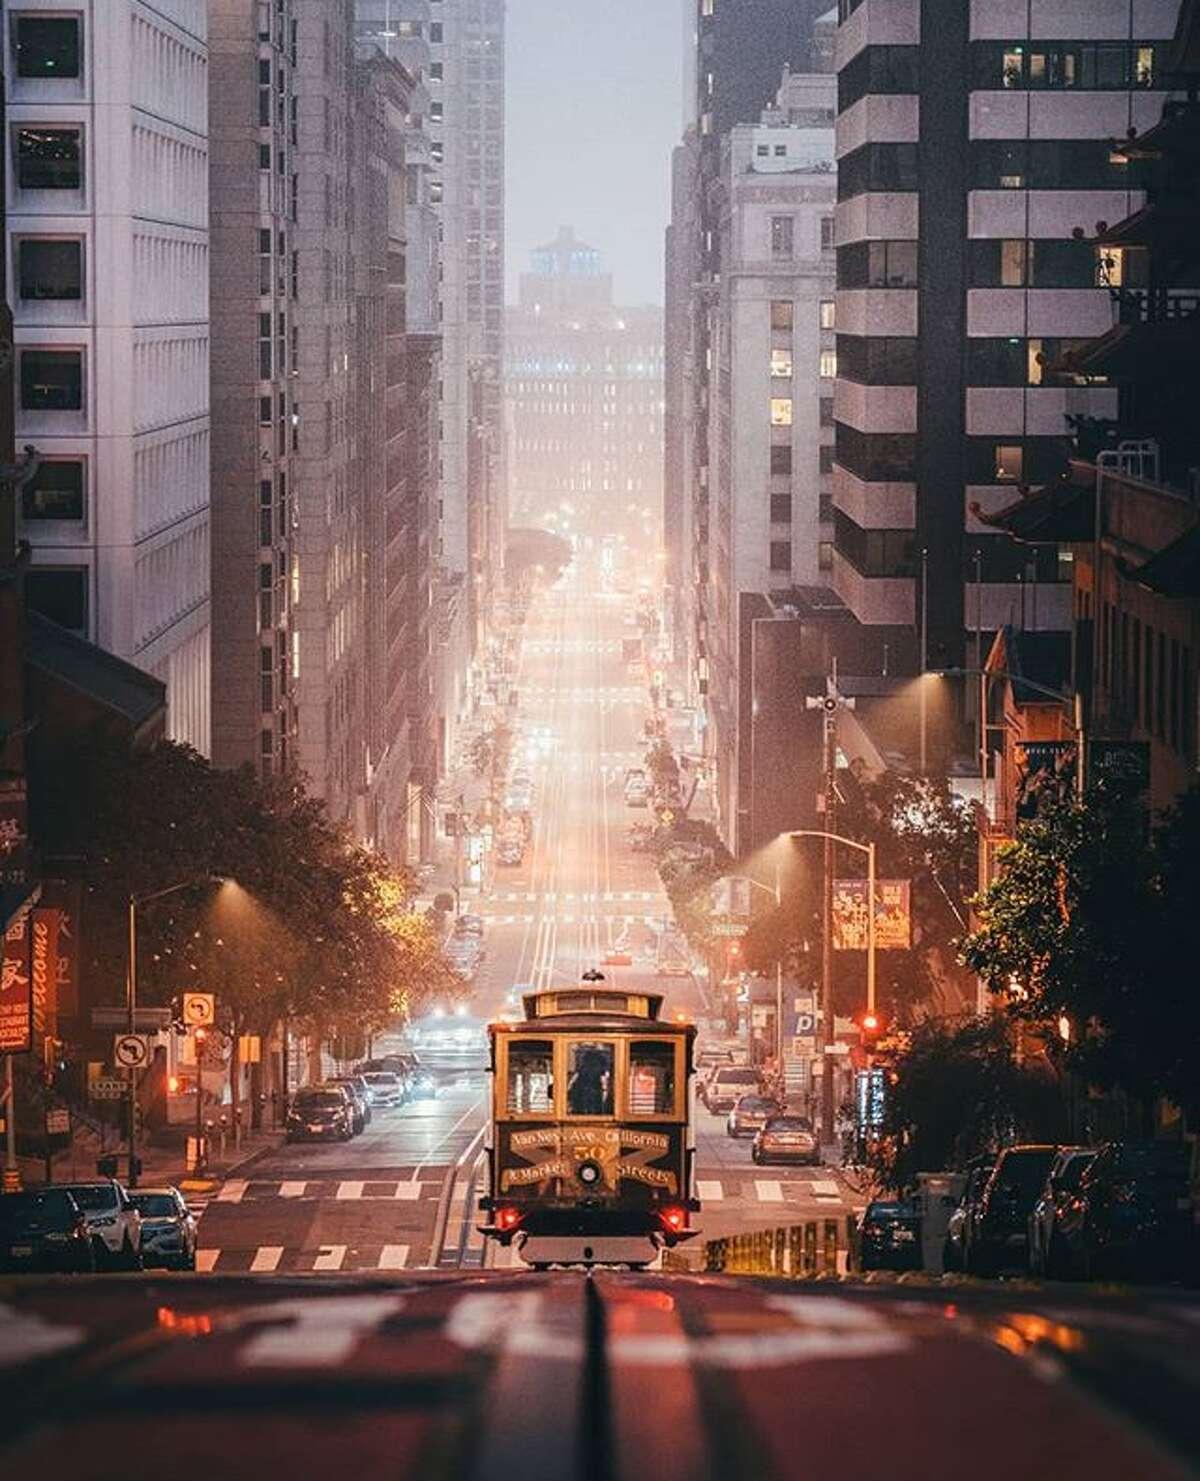 @aj.kreativ captured a foggy cable car ride on California Street in San Francisco.